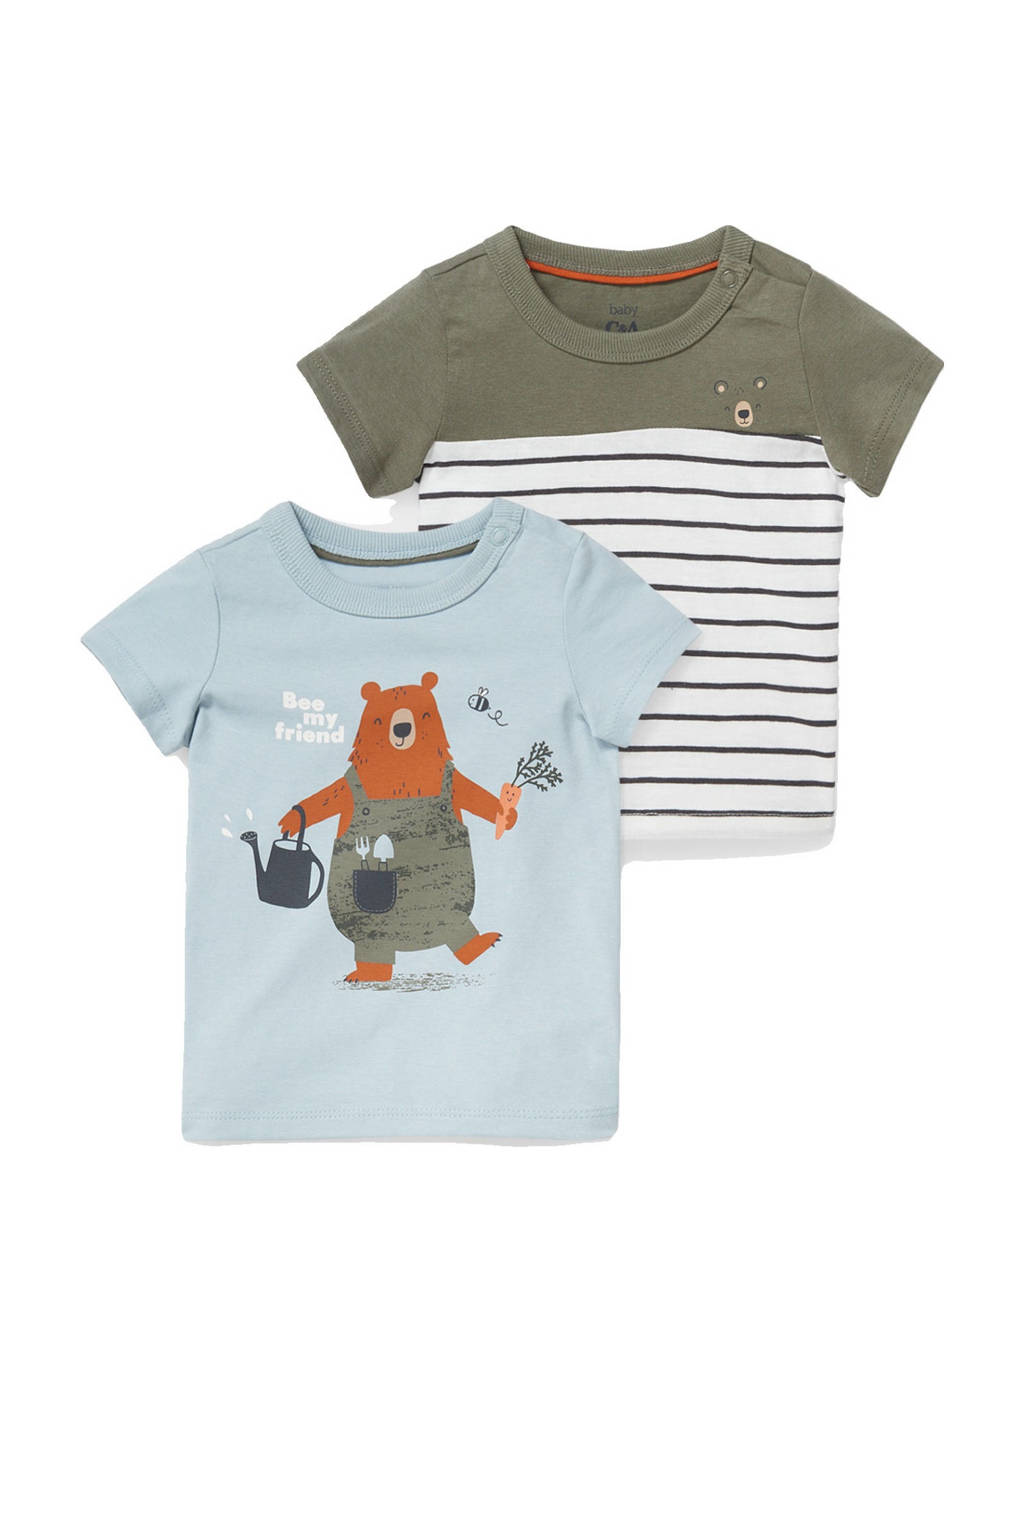 C&A Baby Club T-shirt - set van 2 blauw/wit/donkergroen, Blauw/wit/donkergroen